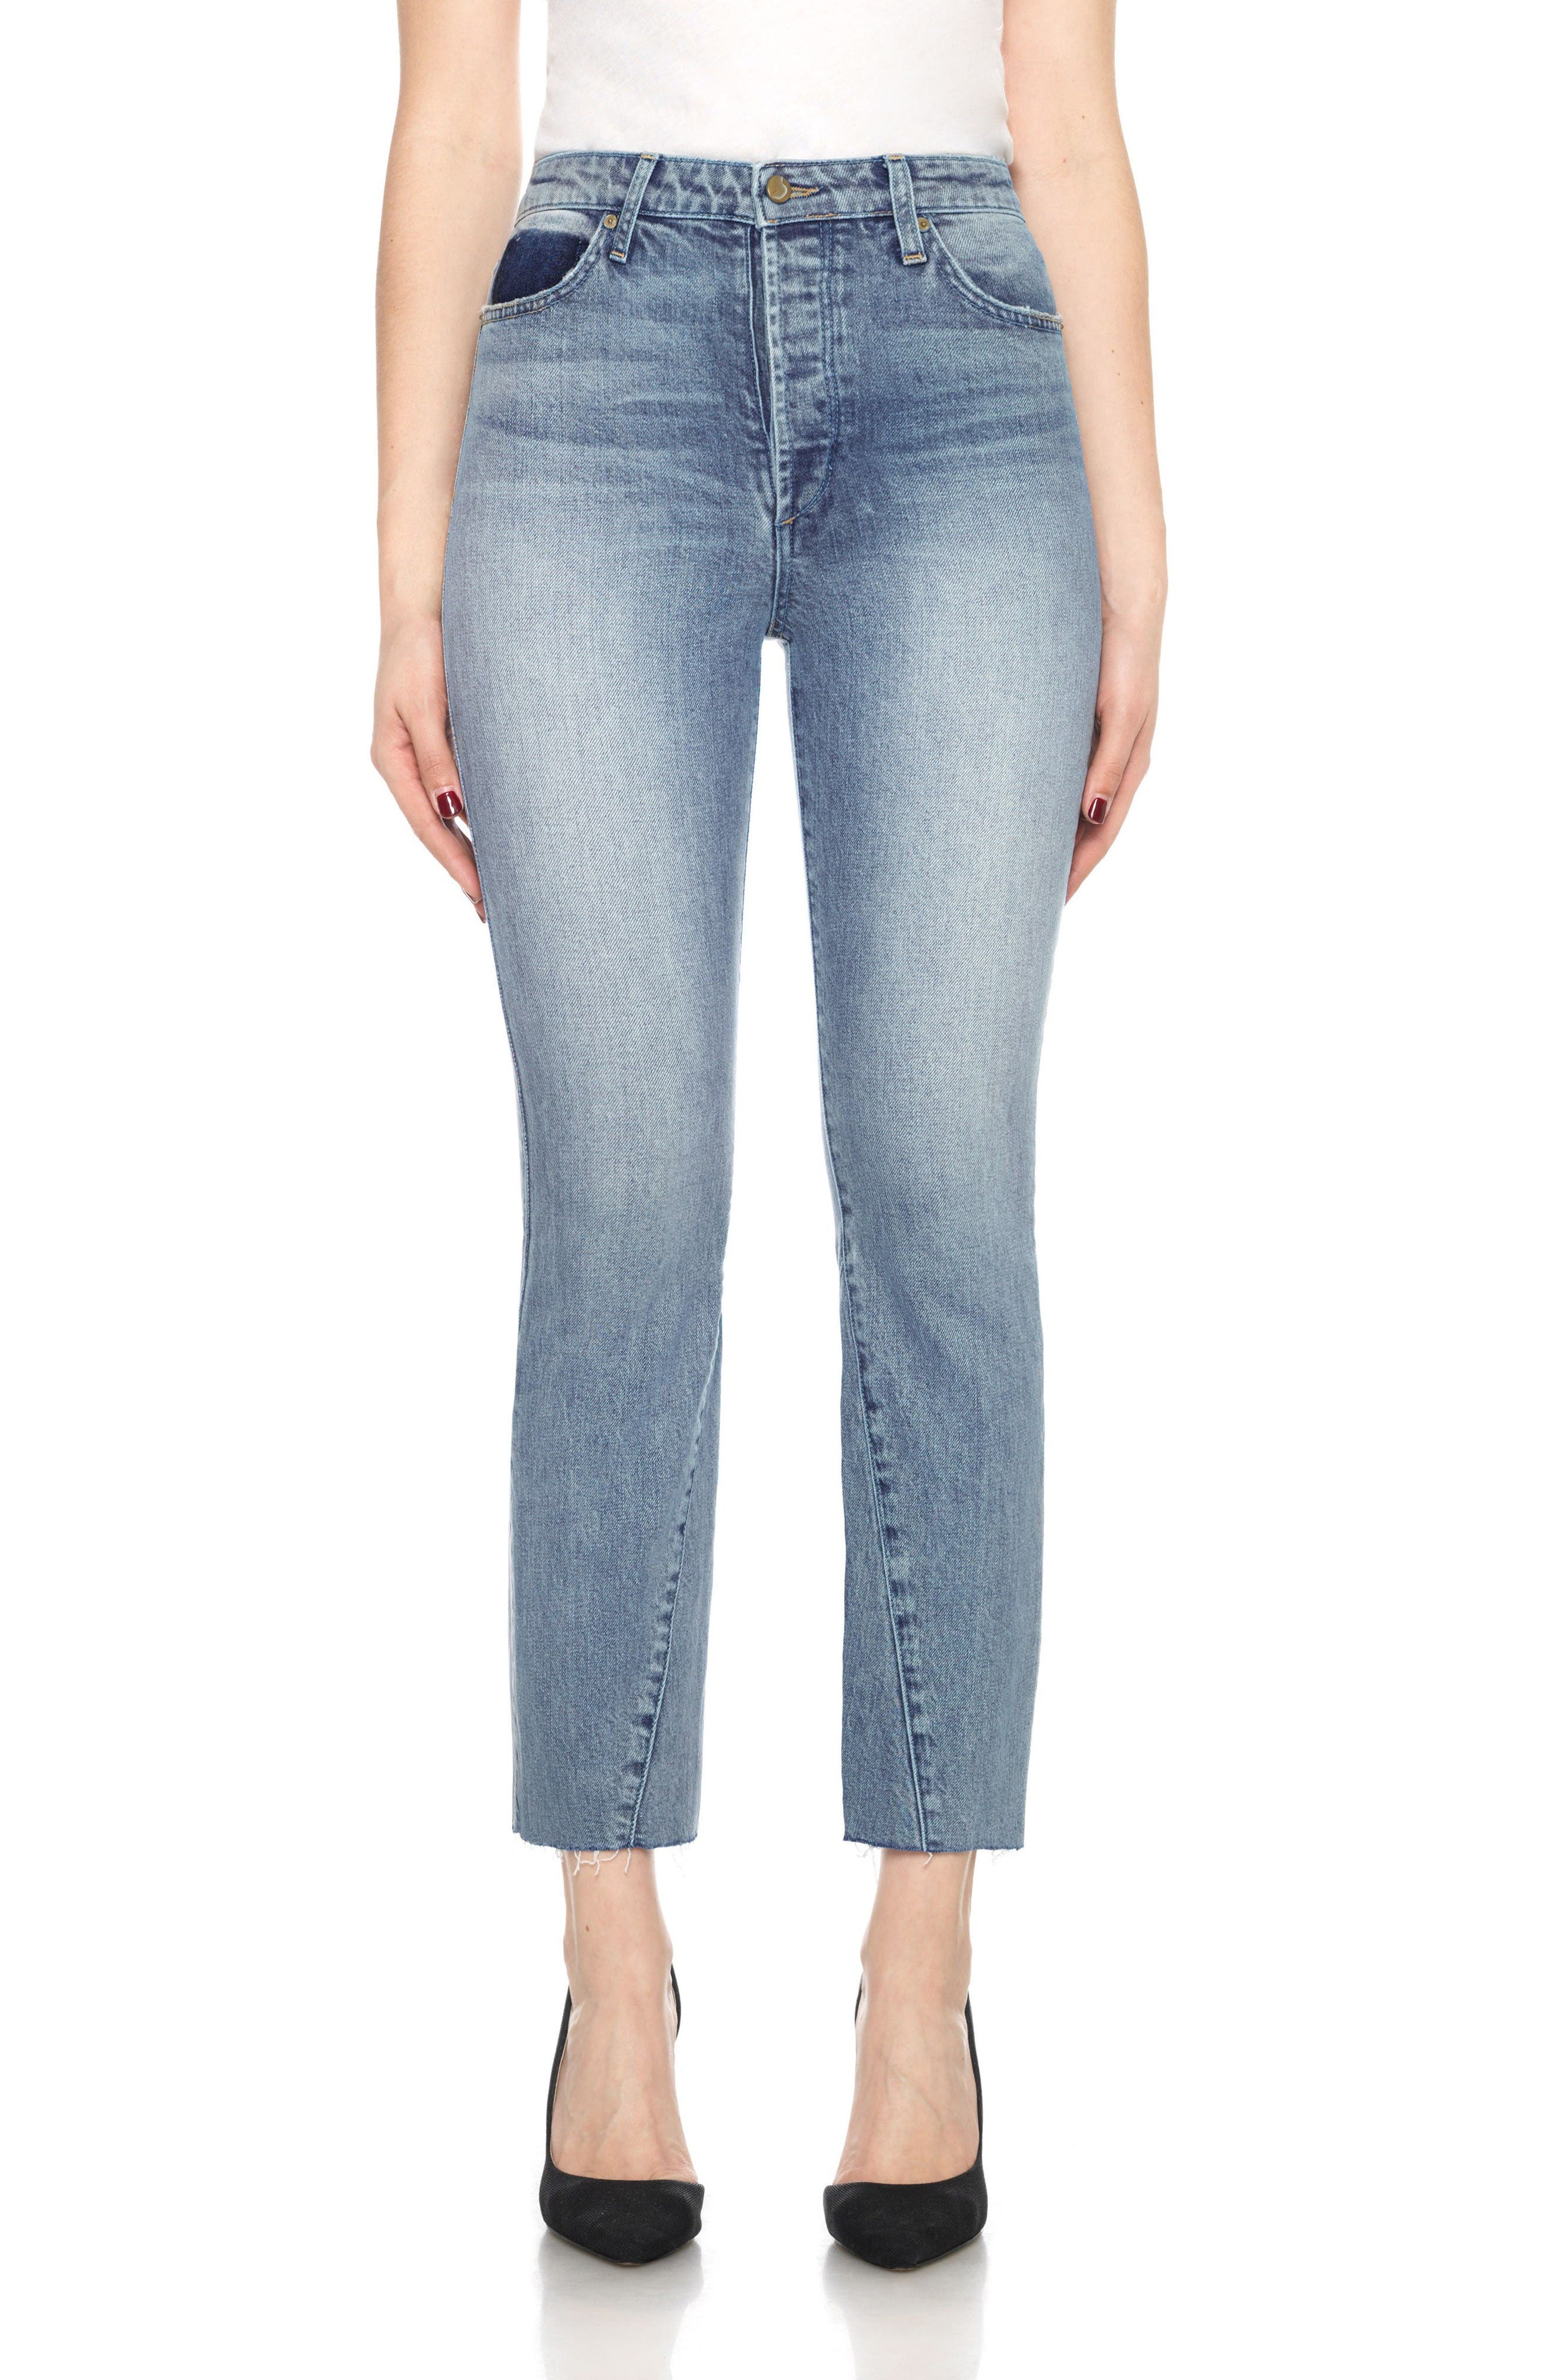 JOES Collectors - Debbie High Waist Straight Crop Jeans